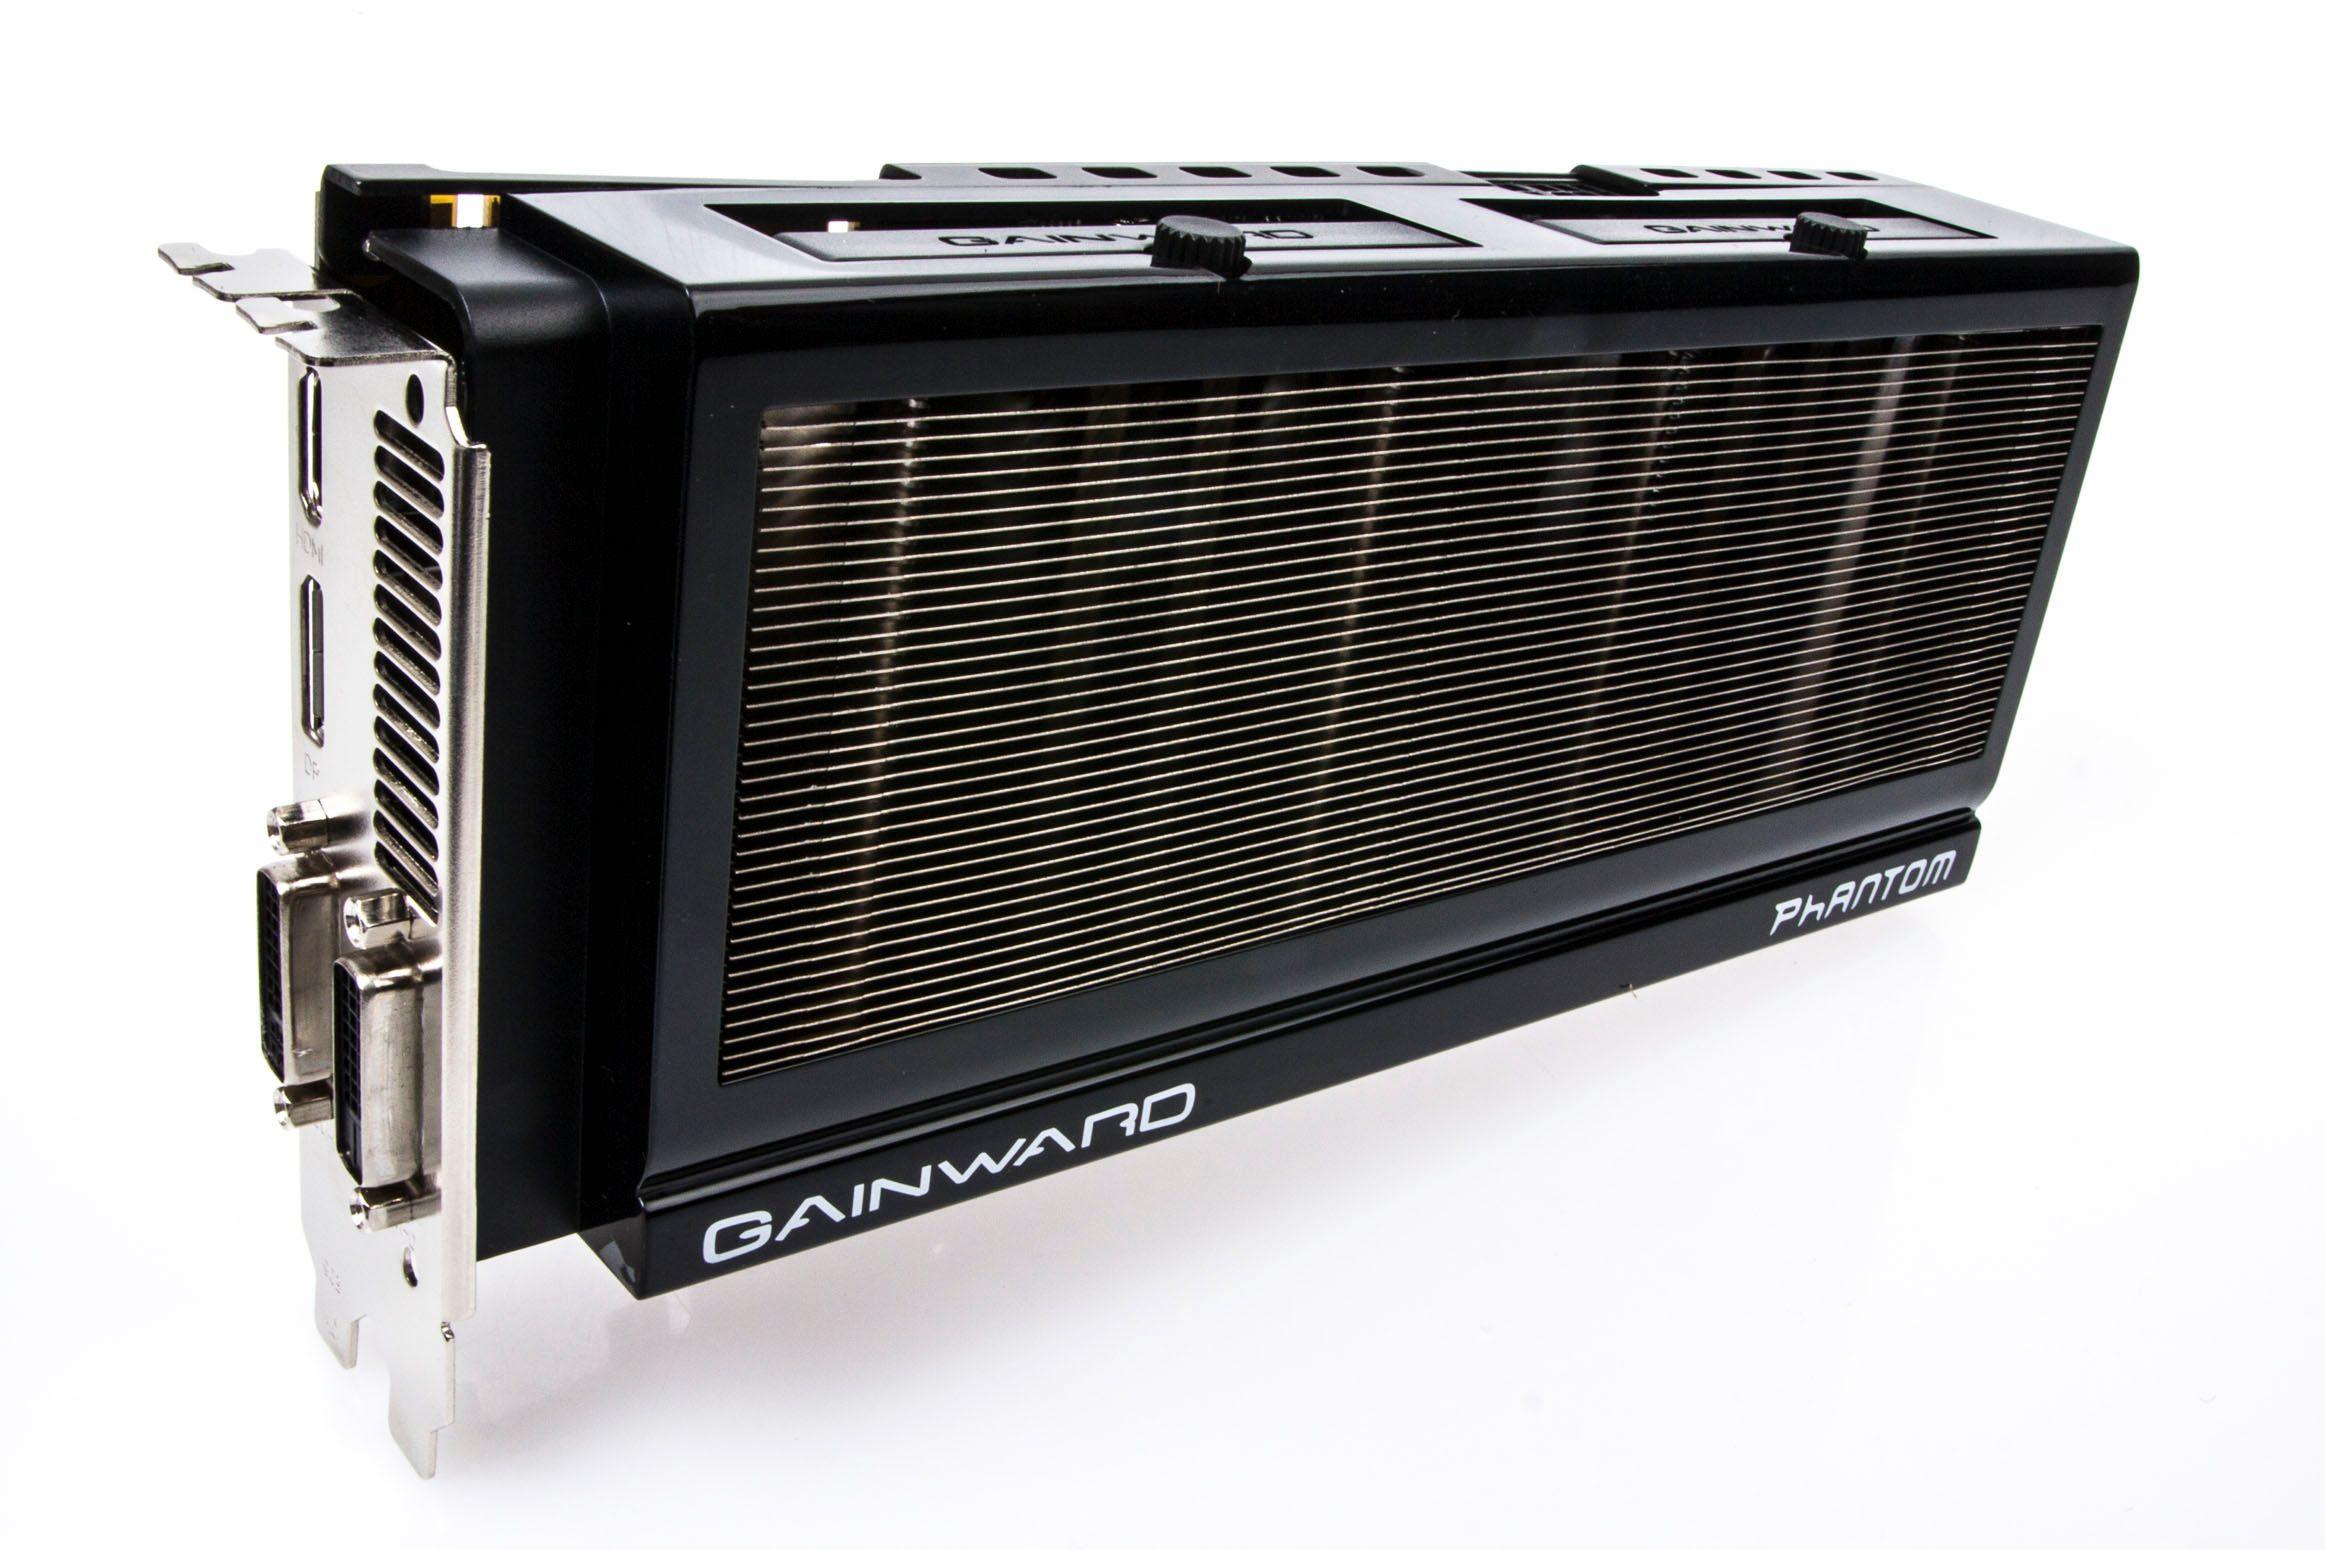 Gainward GeForce GTX 760 Phantom.Foto: Varg Aamo, Hardware.no